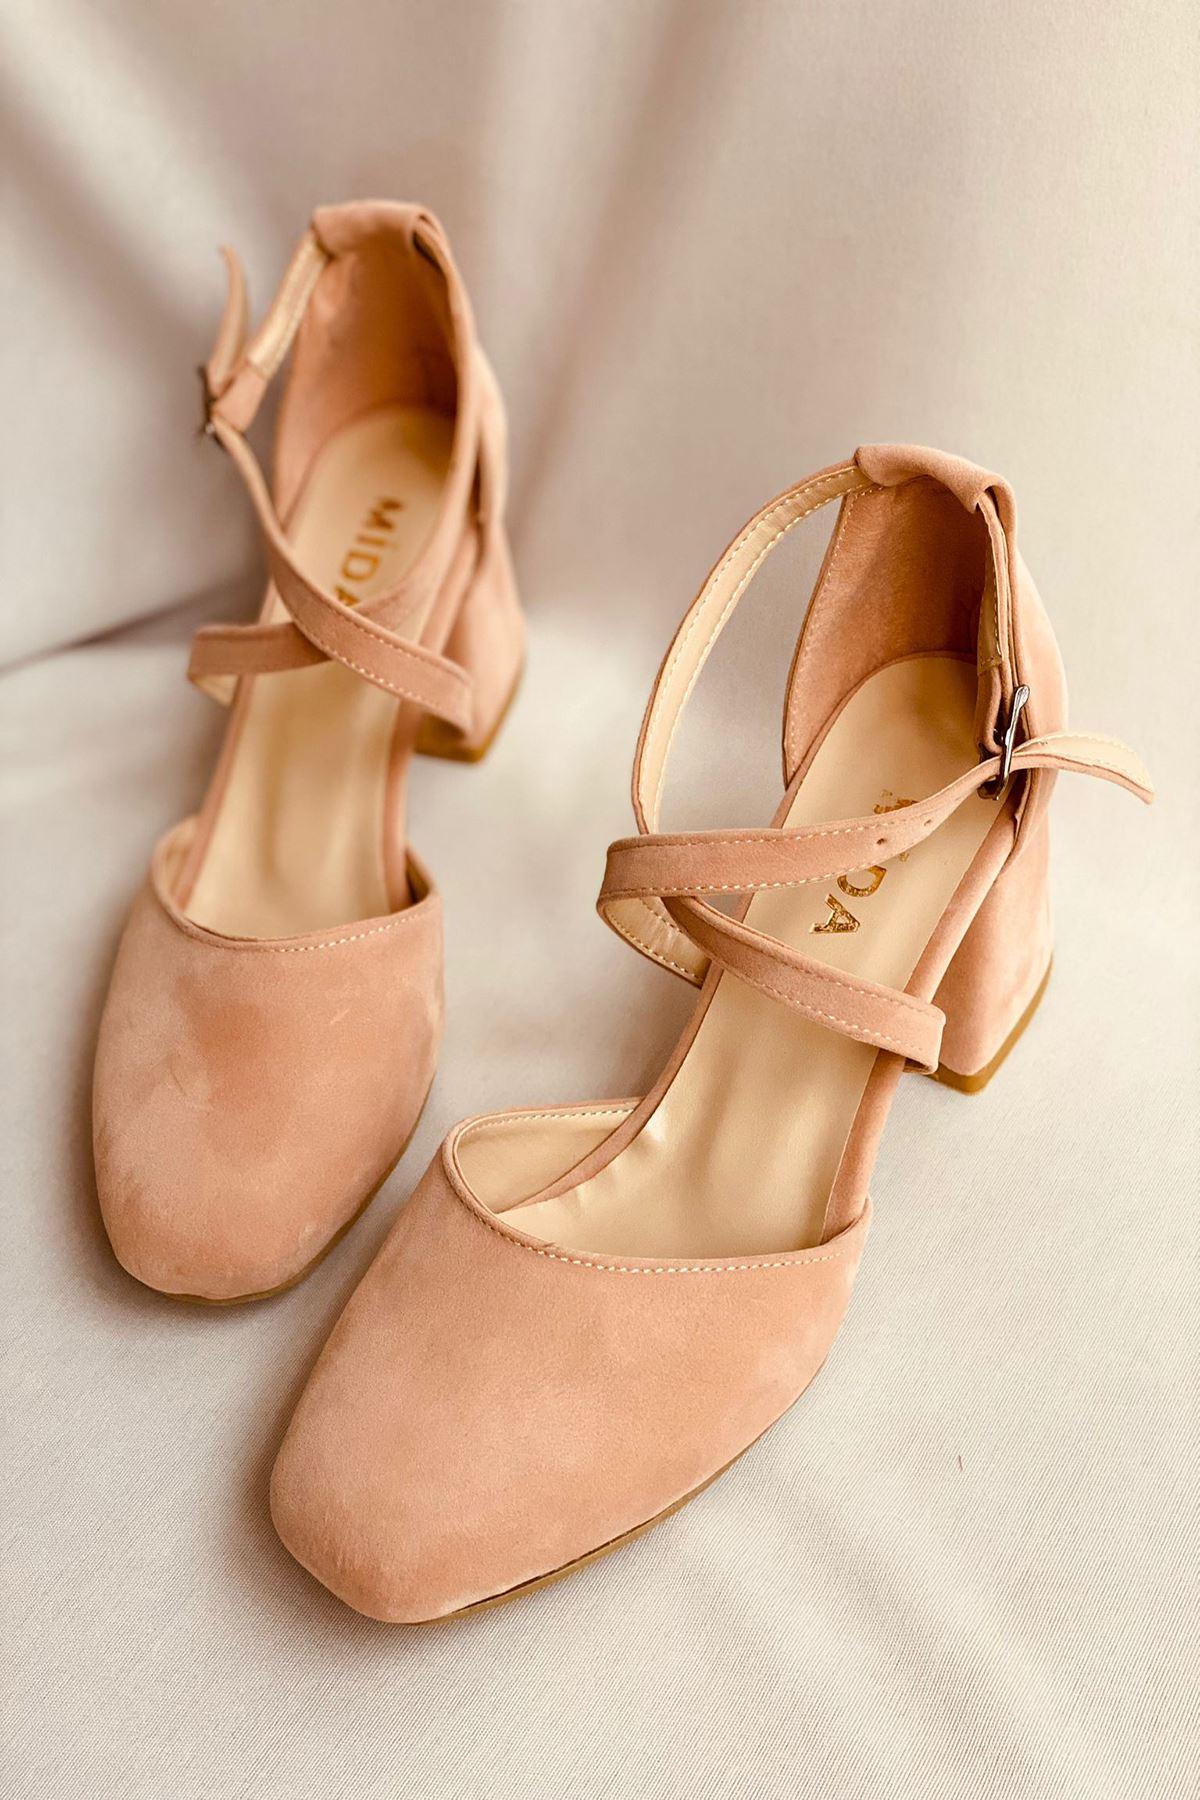 Y191 Pudra Süet Topuklu Ayakkabı